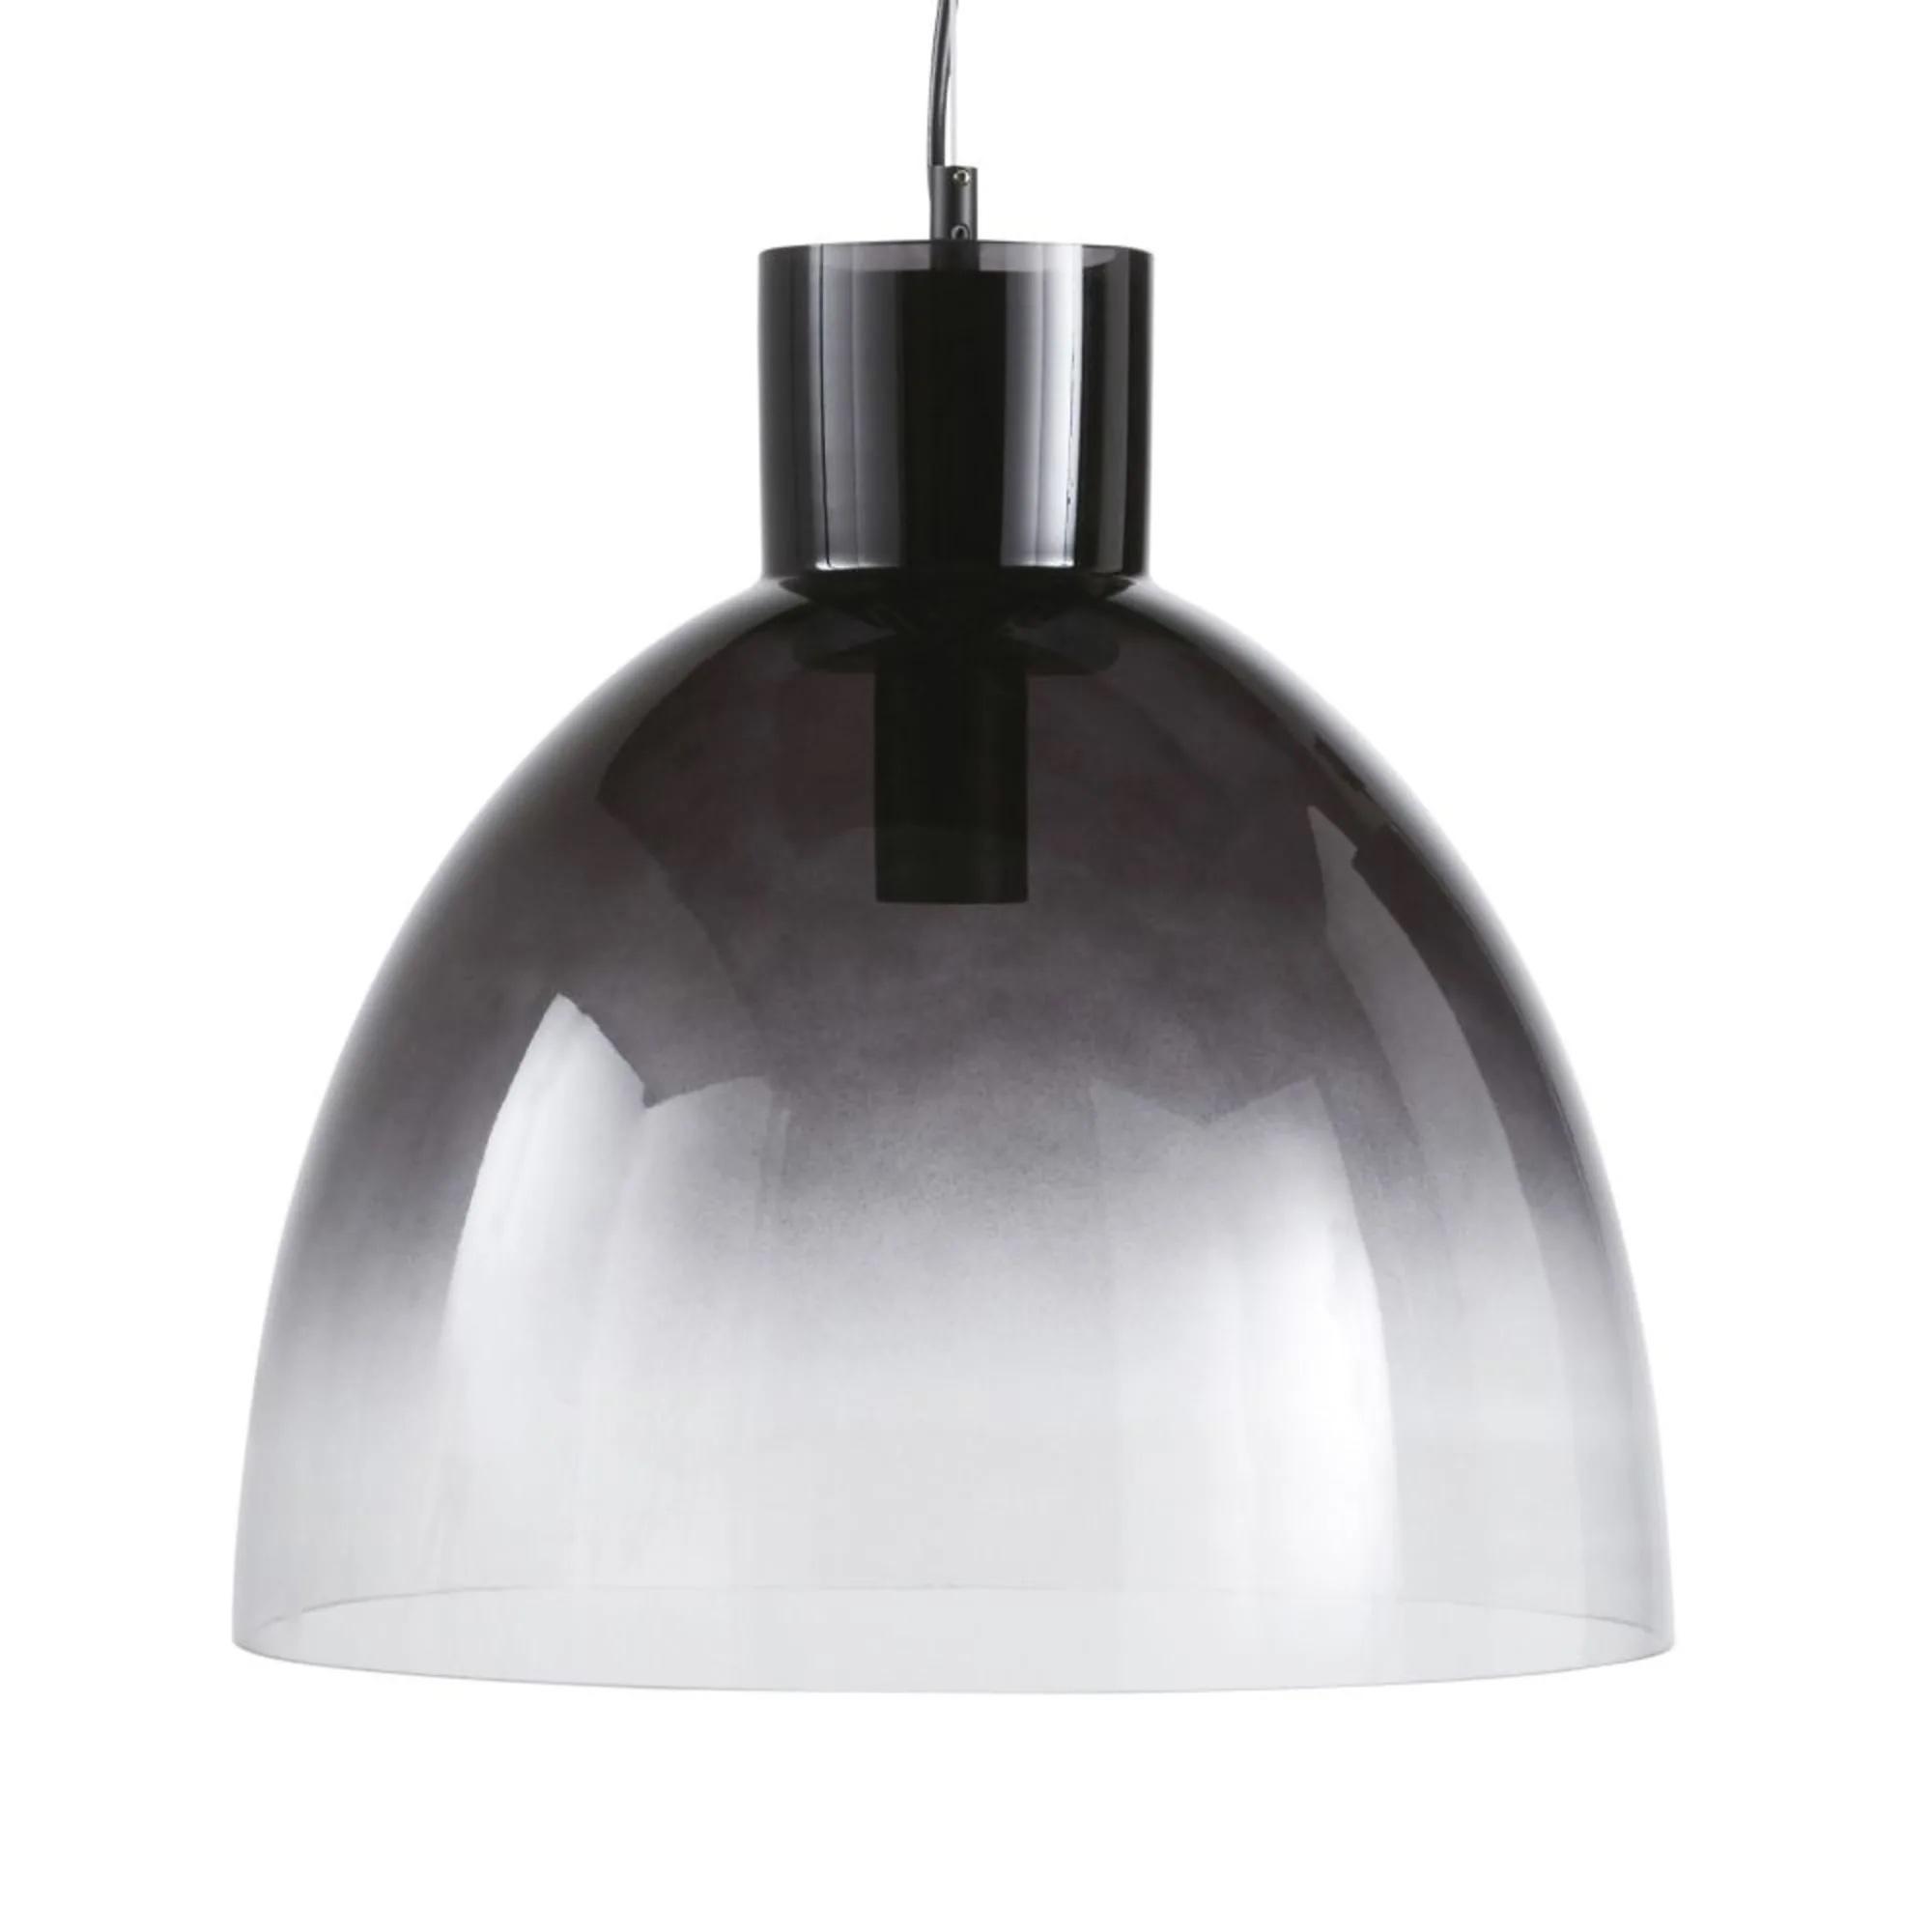 Lámpara de techo cristal tintado negro transparente efecto degradado.